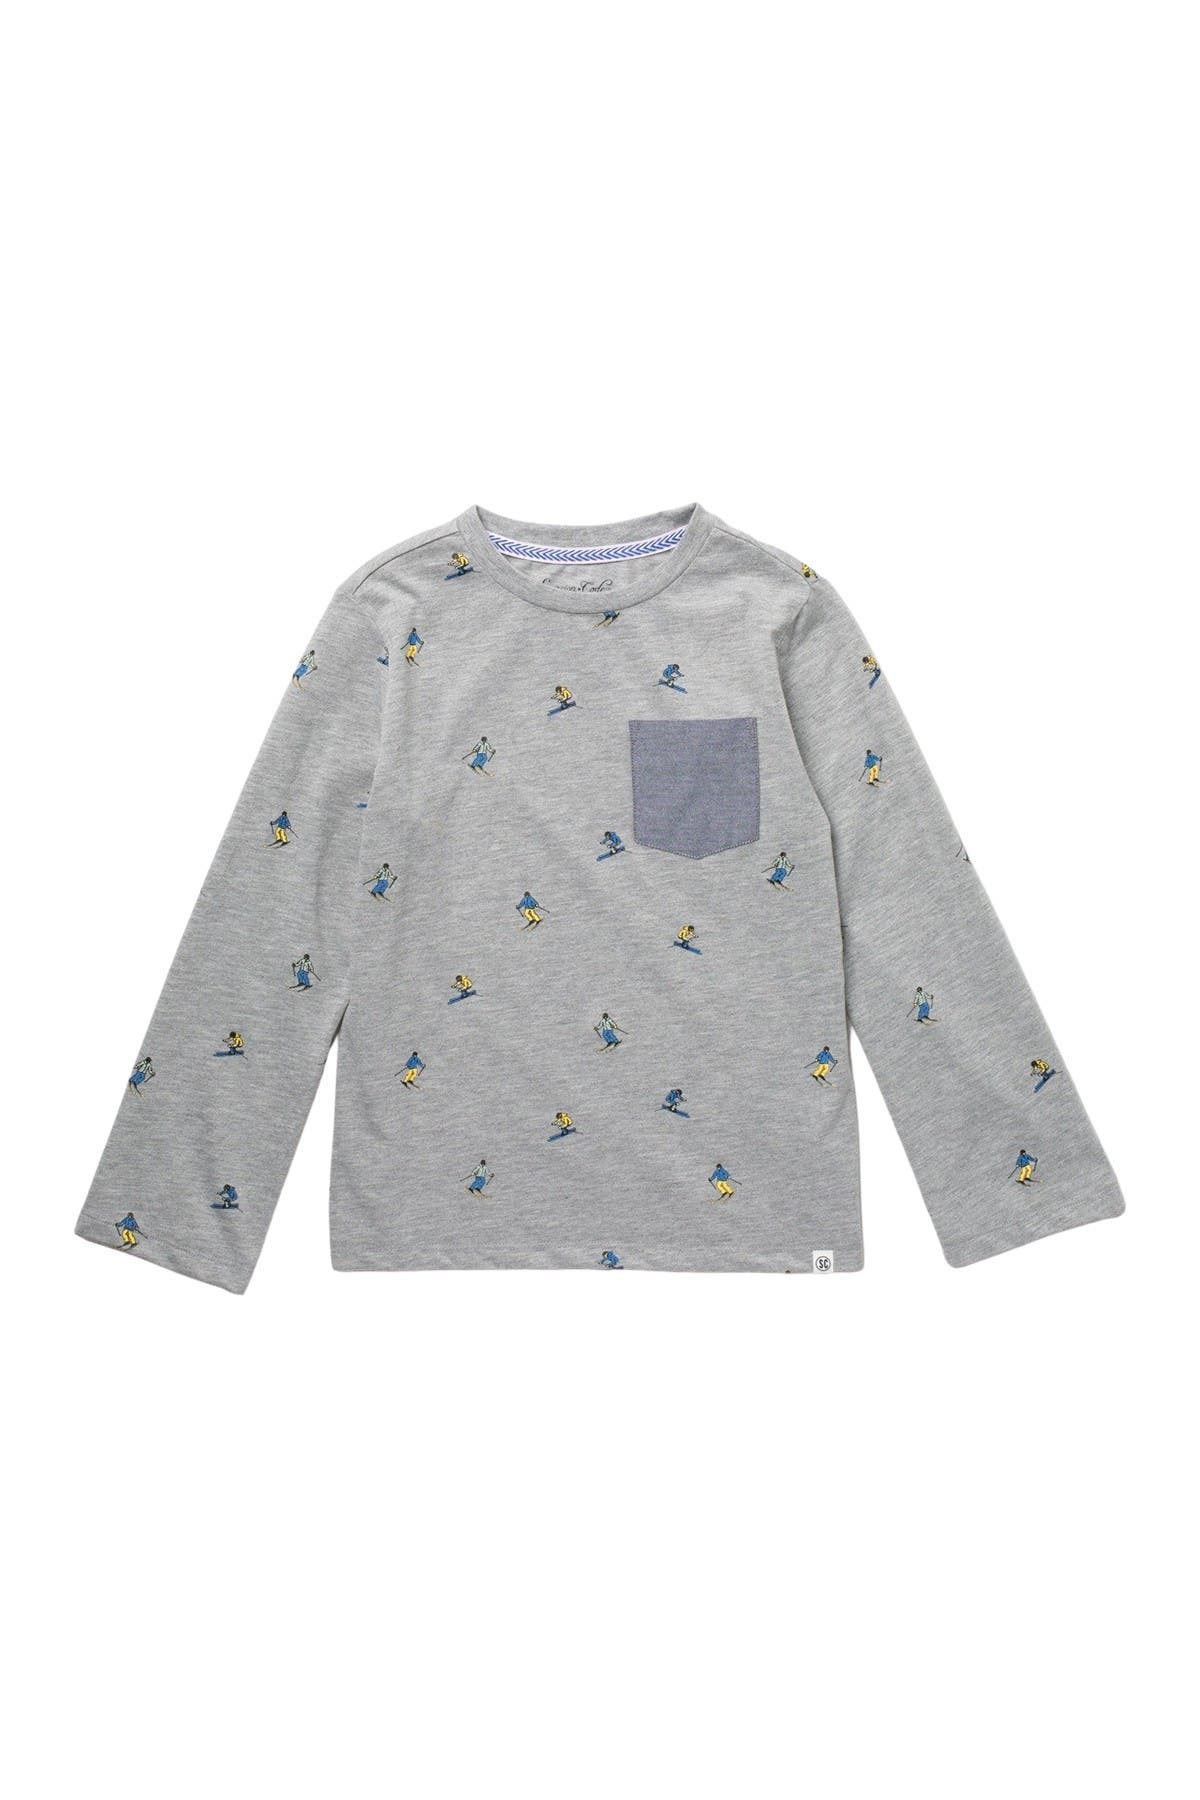 Image of Sovereign Code Wrap Long Sleeve Pocket T-Shirt